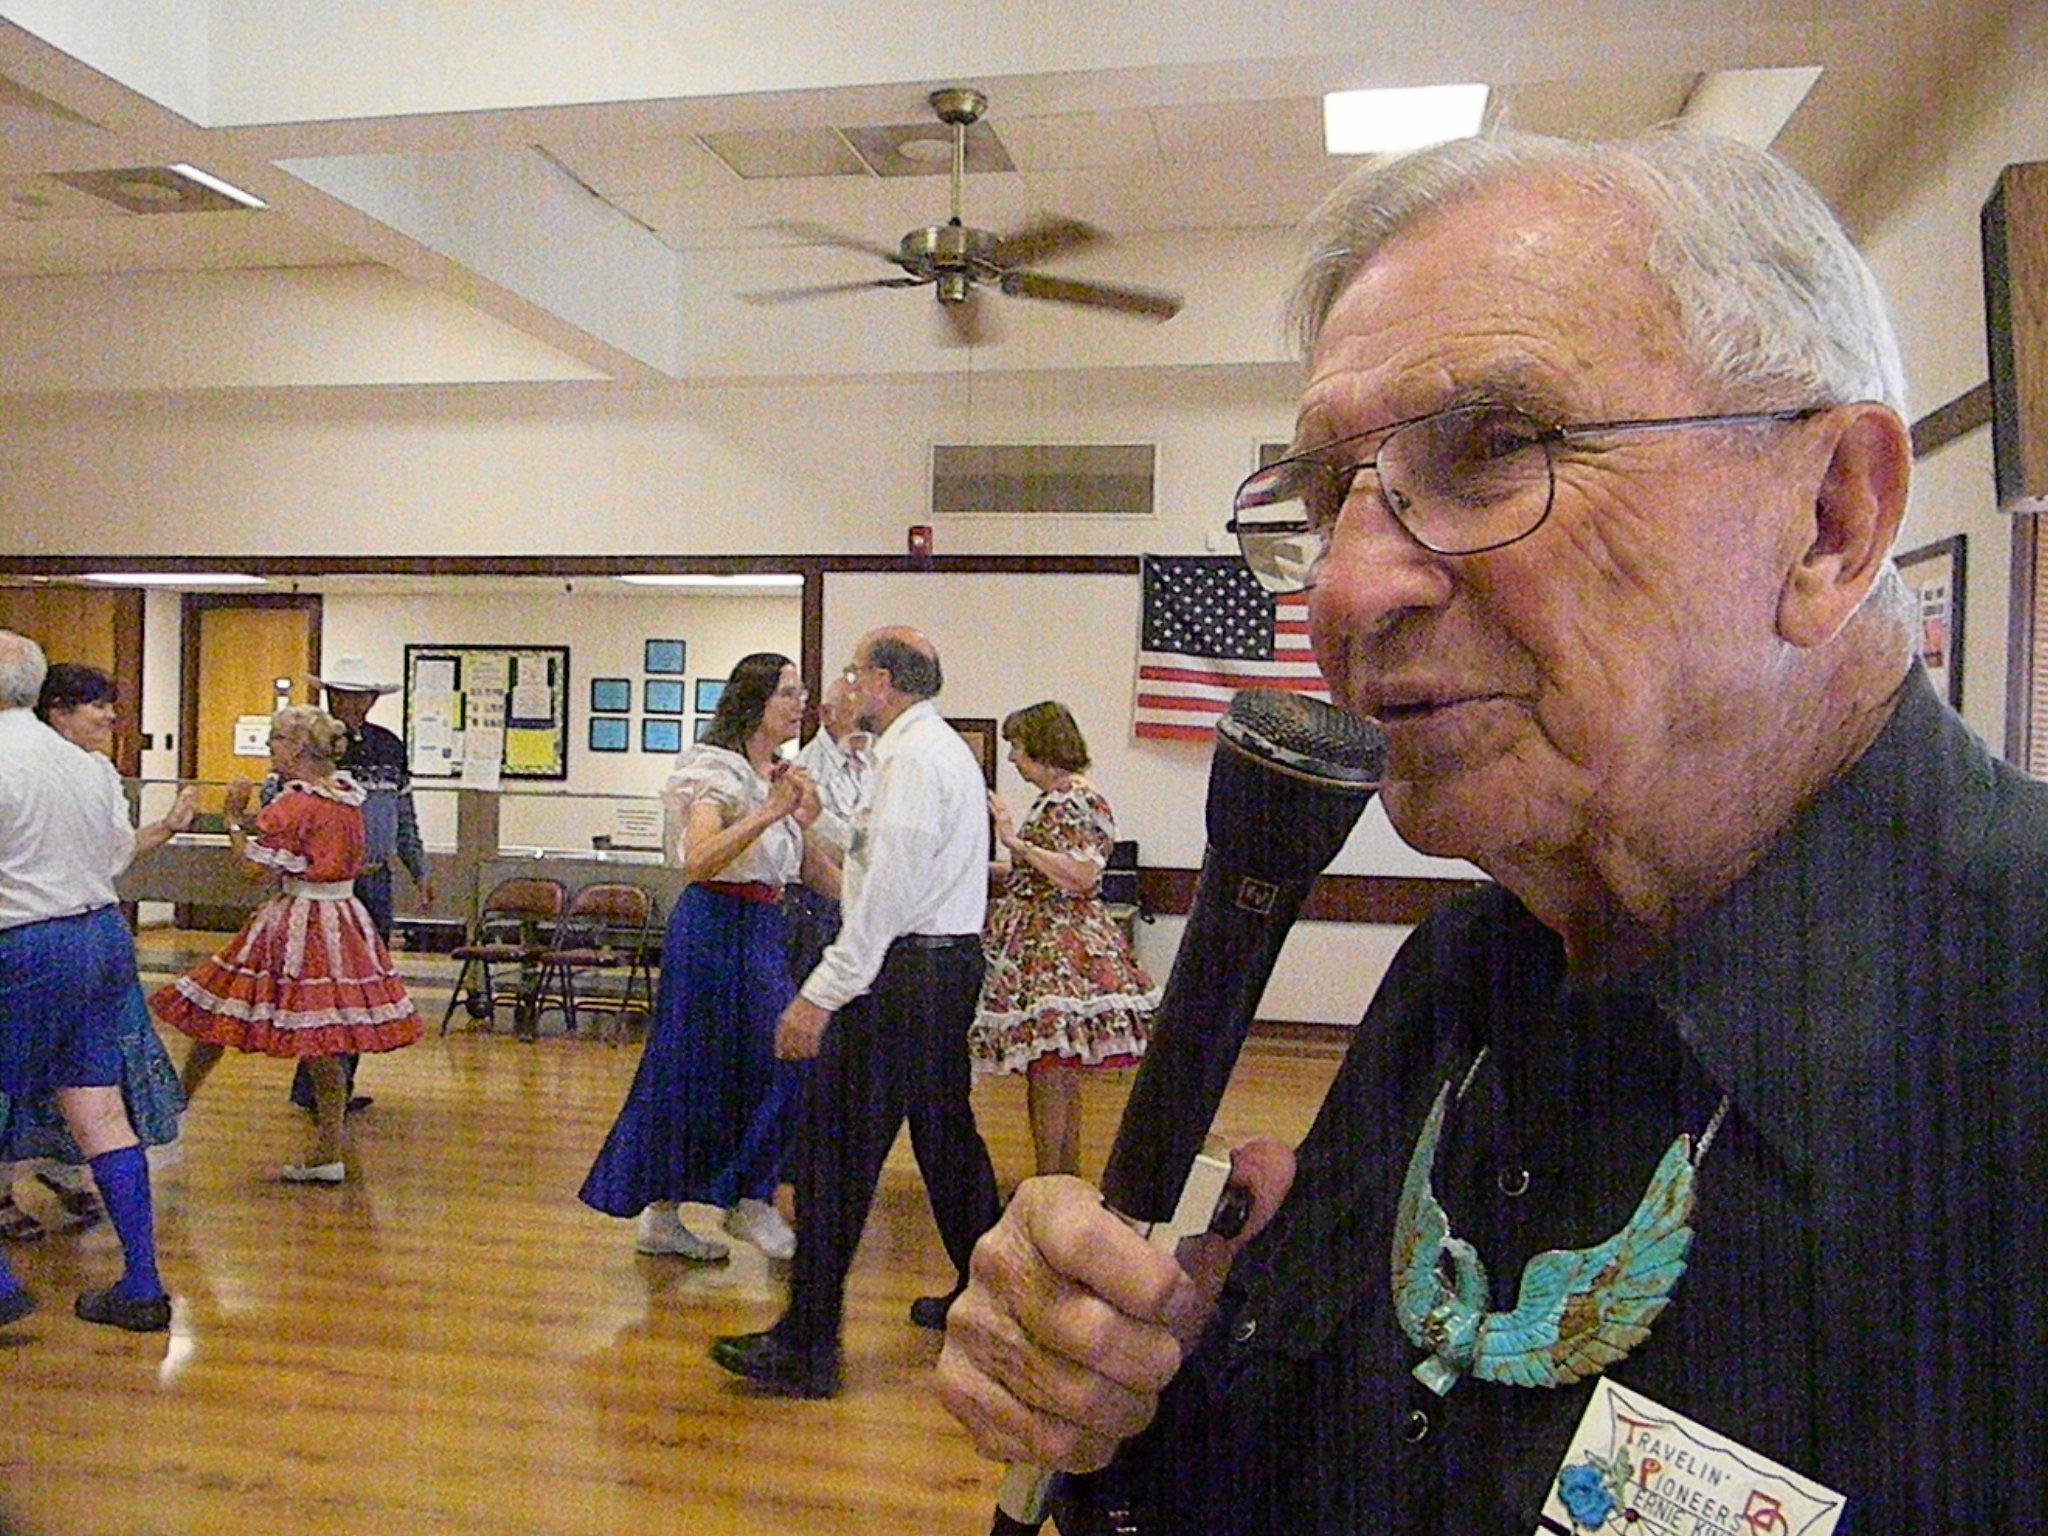 World's Oldest Square Dance Caller Keeps Central Valley Dancing [Video]